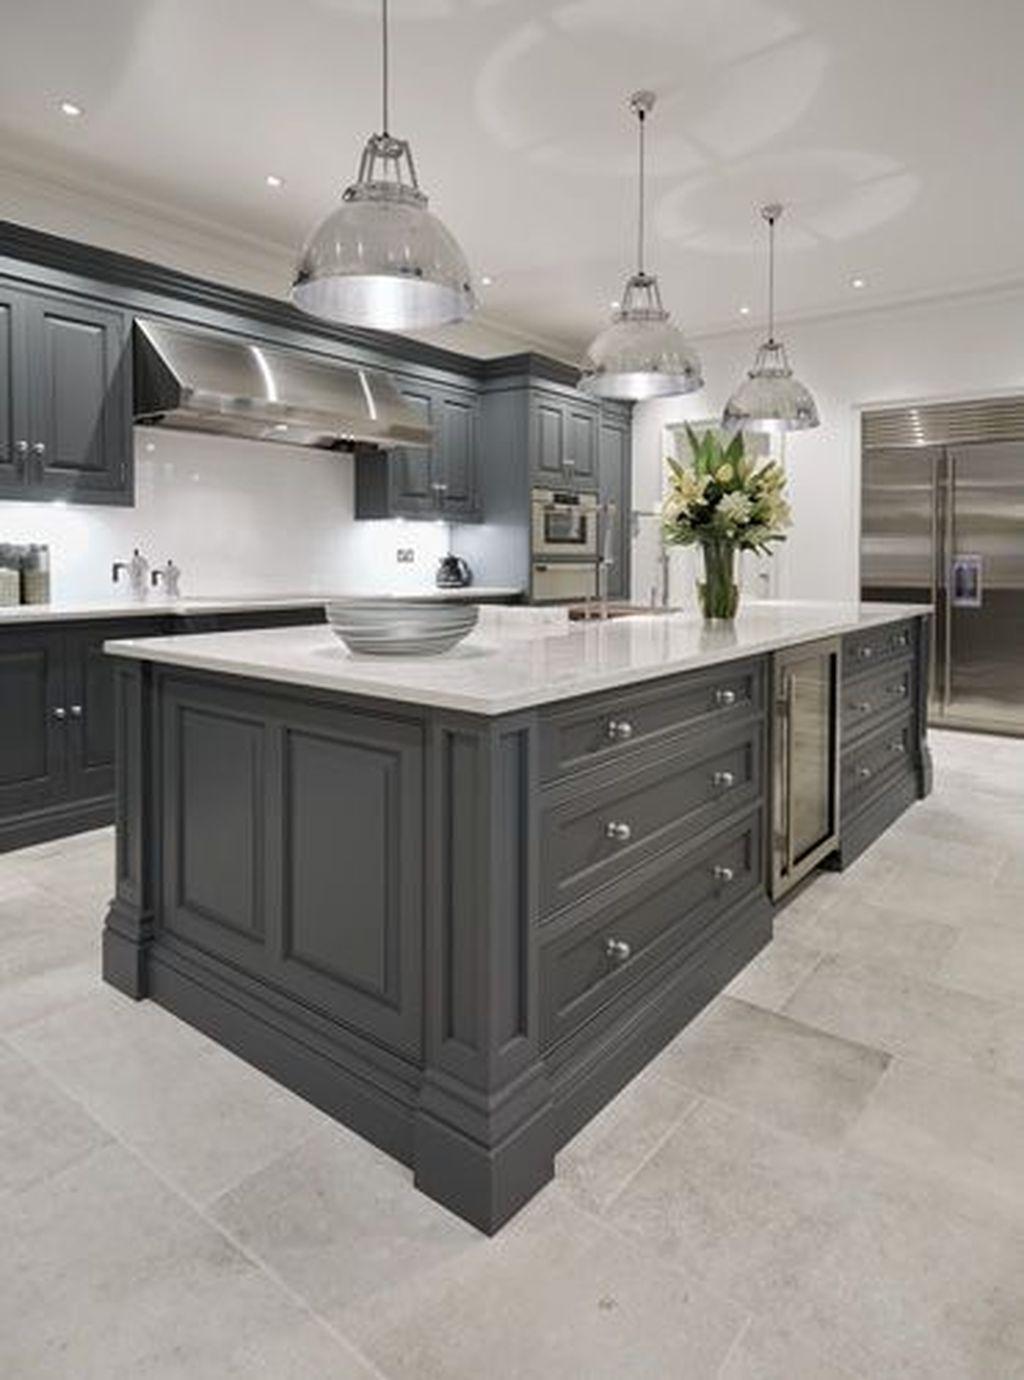 35 elegant kitchen design inspiration elegant kitchen design kitchen inspiration design on kitchen ideas elegant id=62041